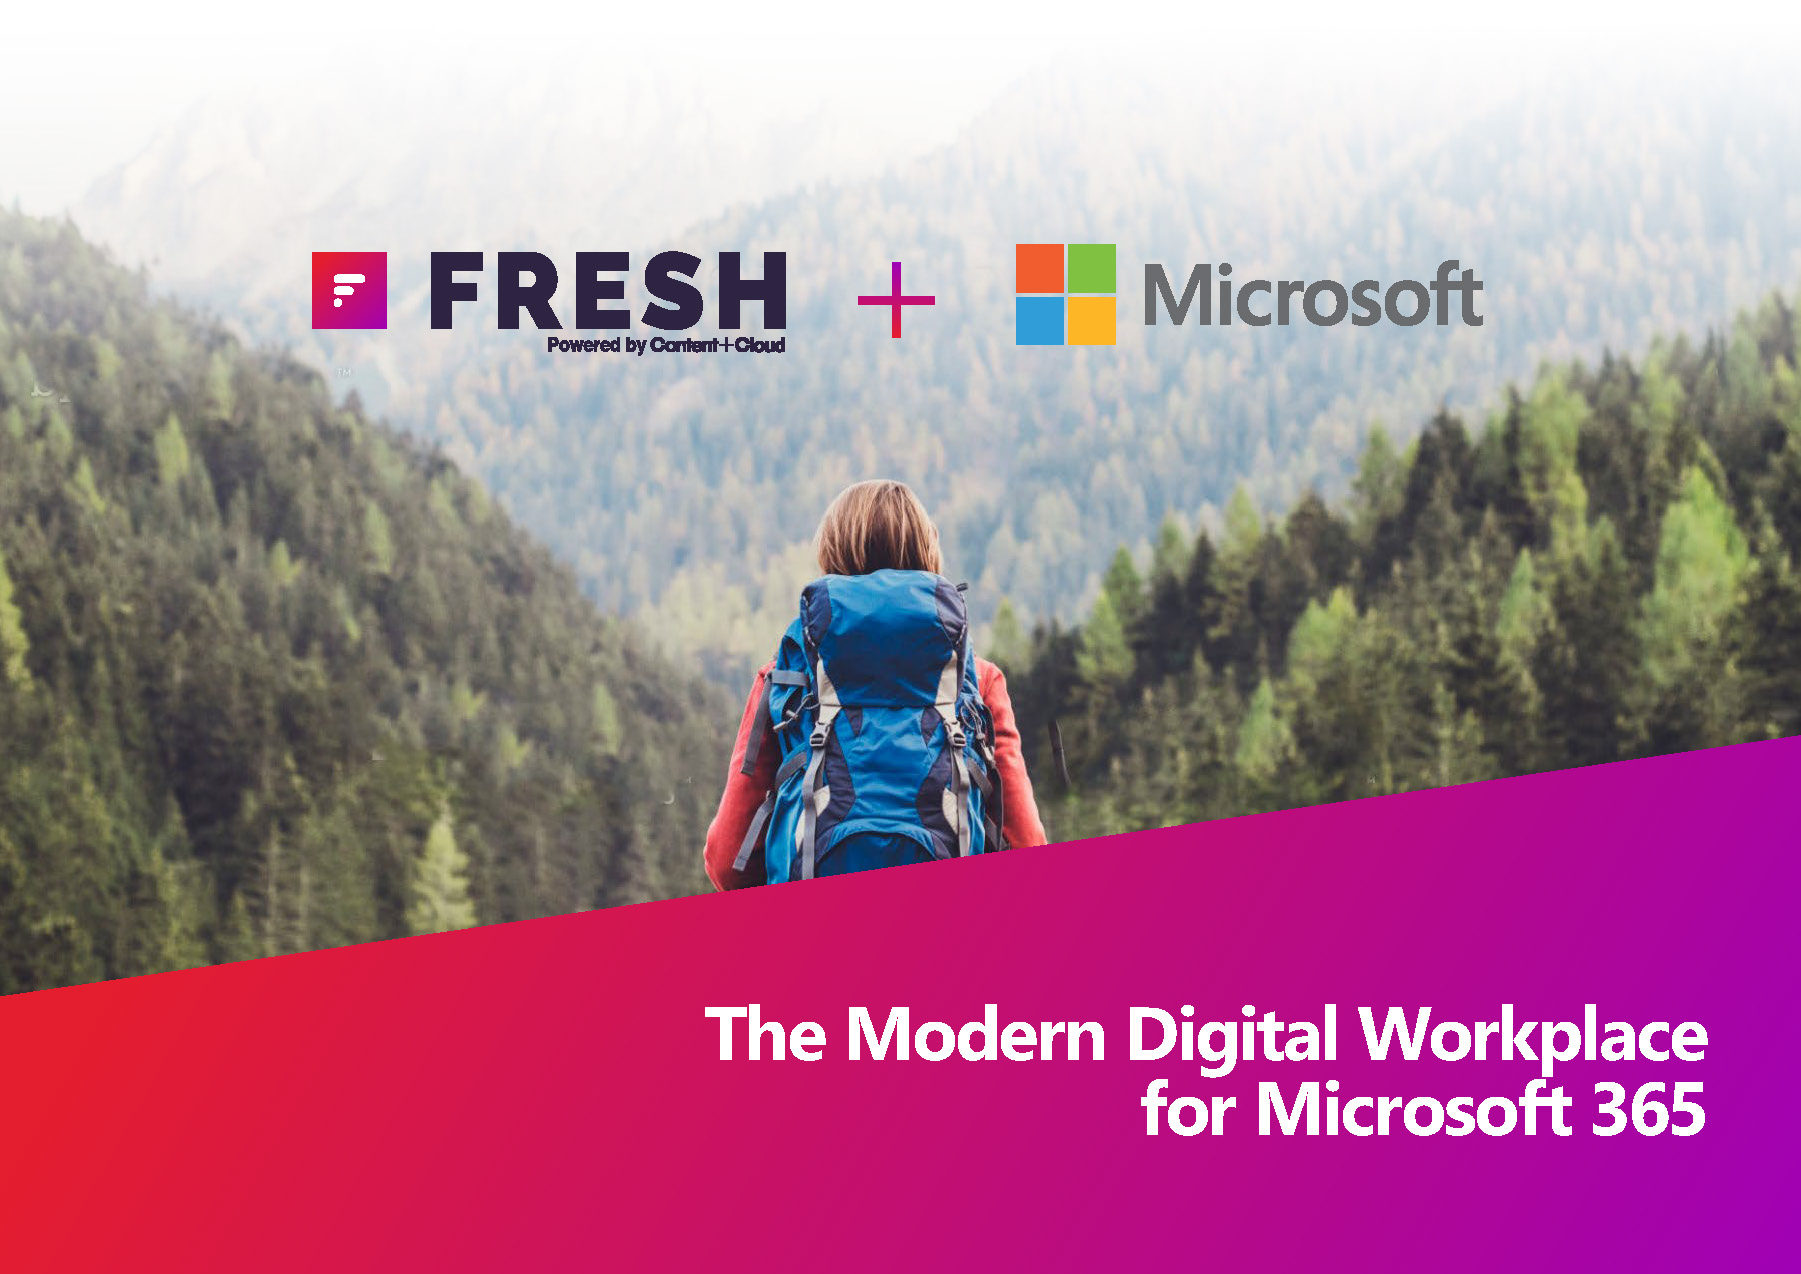 Fresh_ebook Modern Digital Workplace for Microsoft 365 cover image